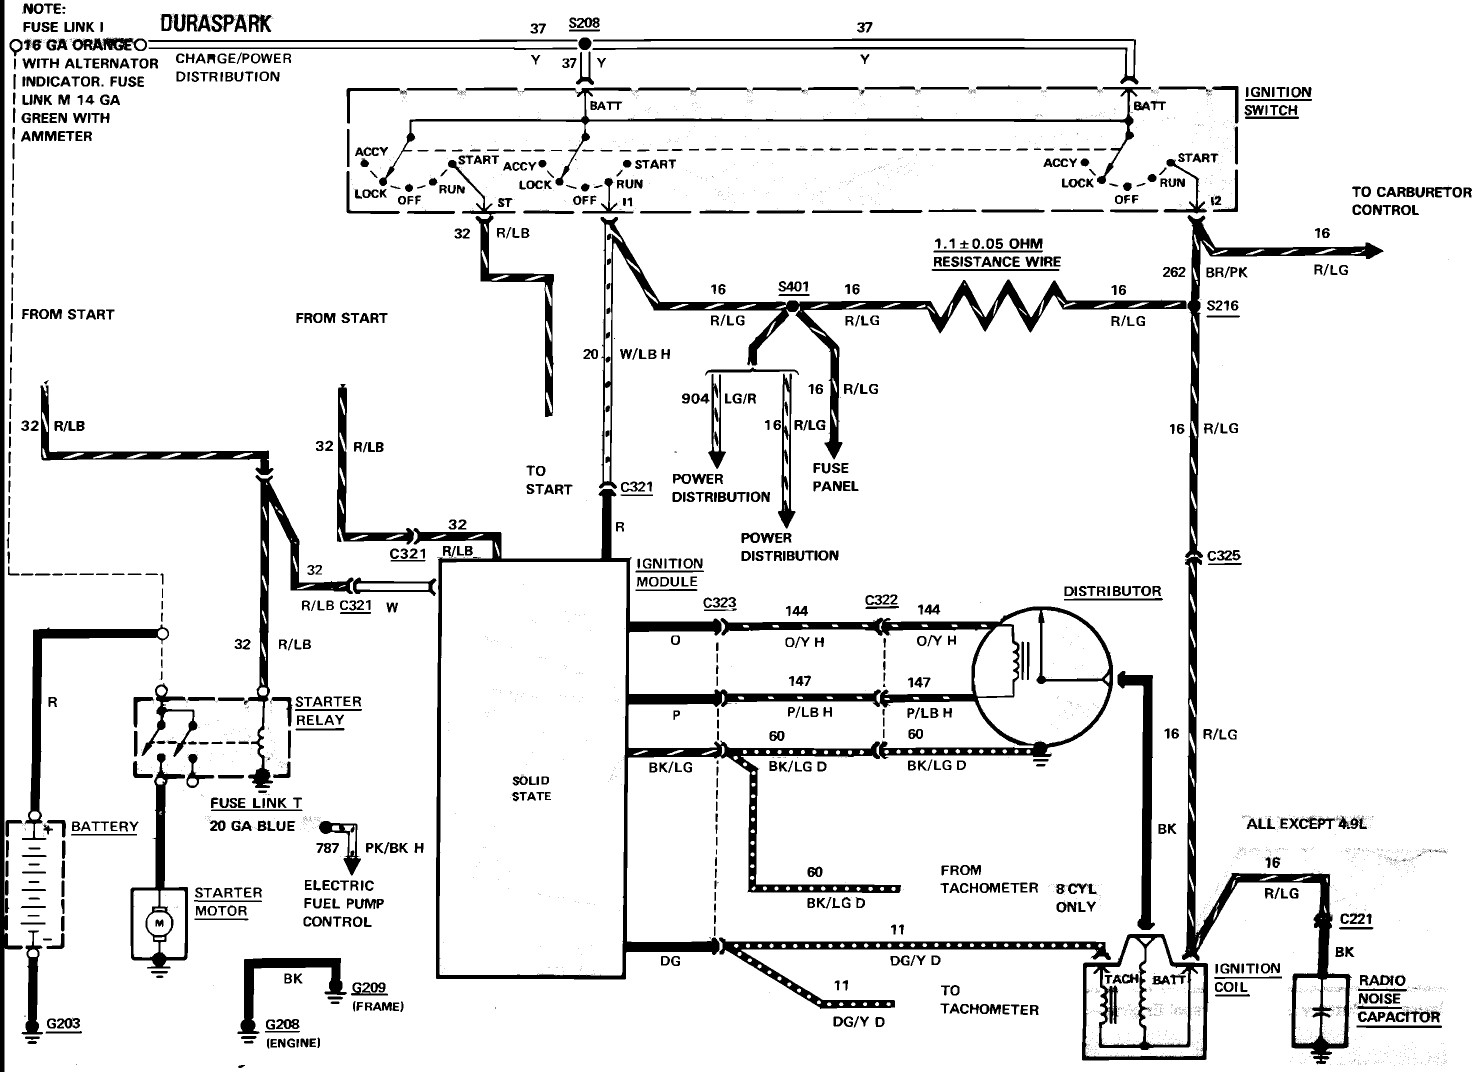 Ford F250 Wiring Diagram Online | Free Wiring Diagram